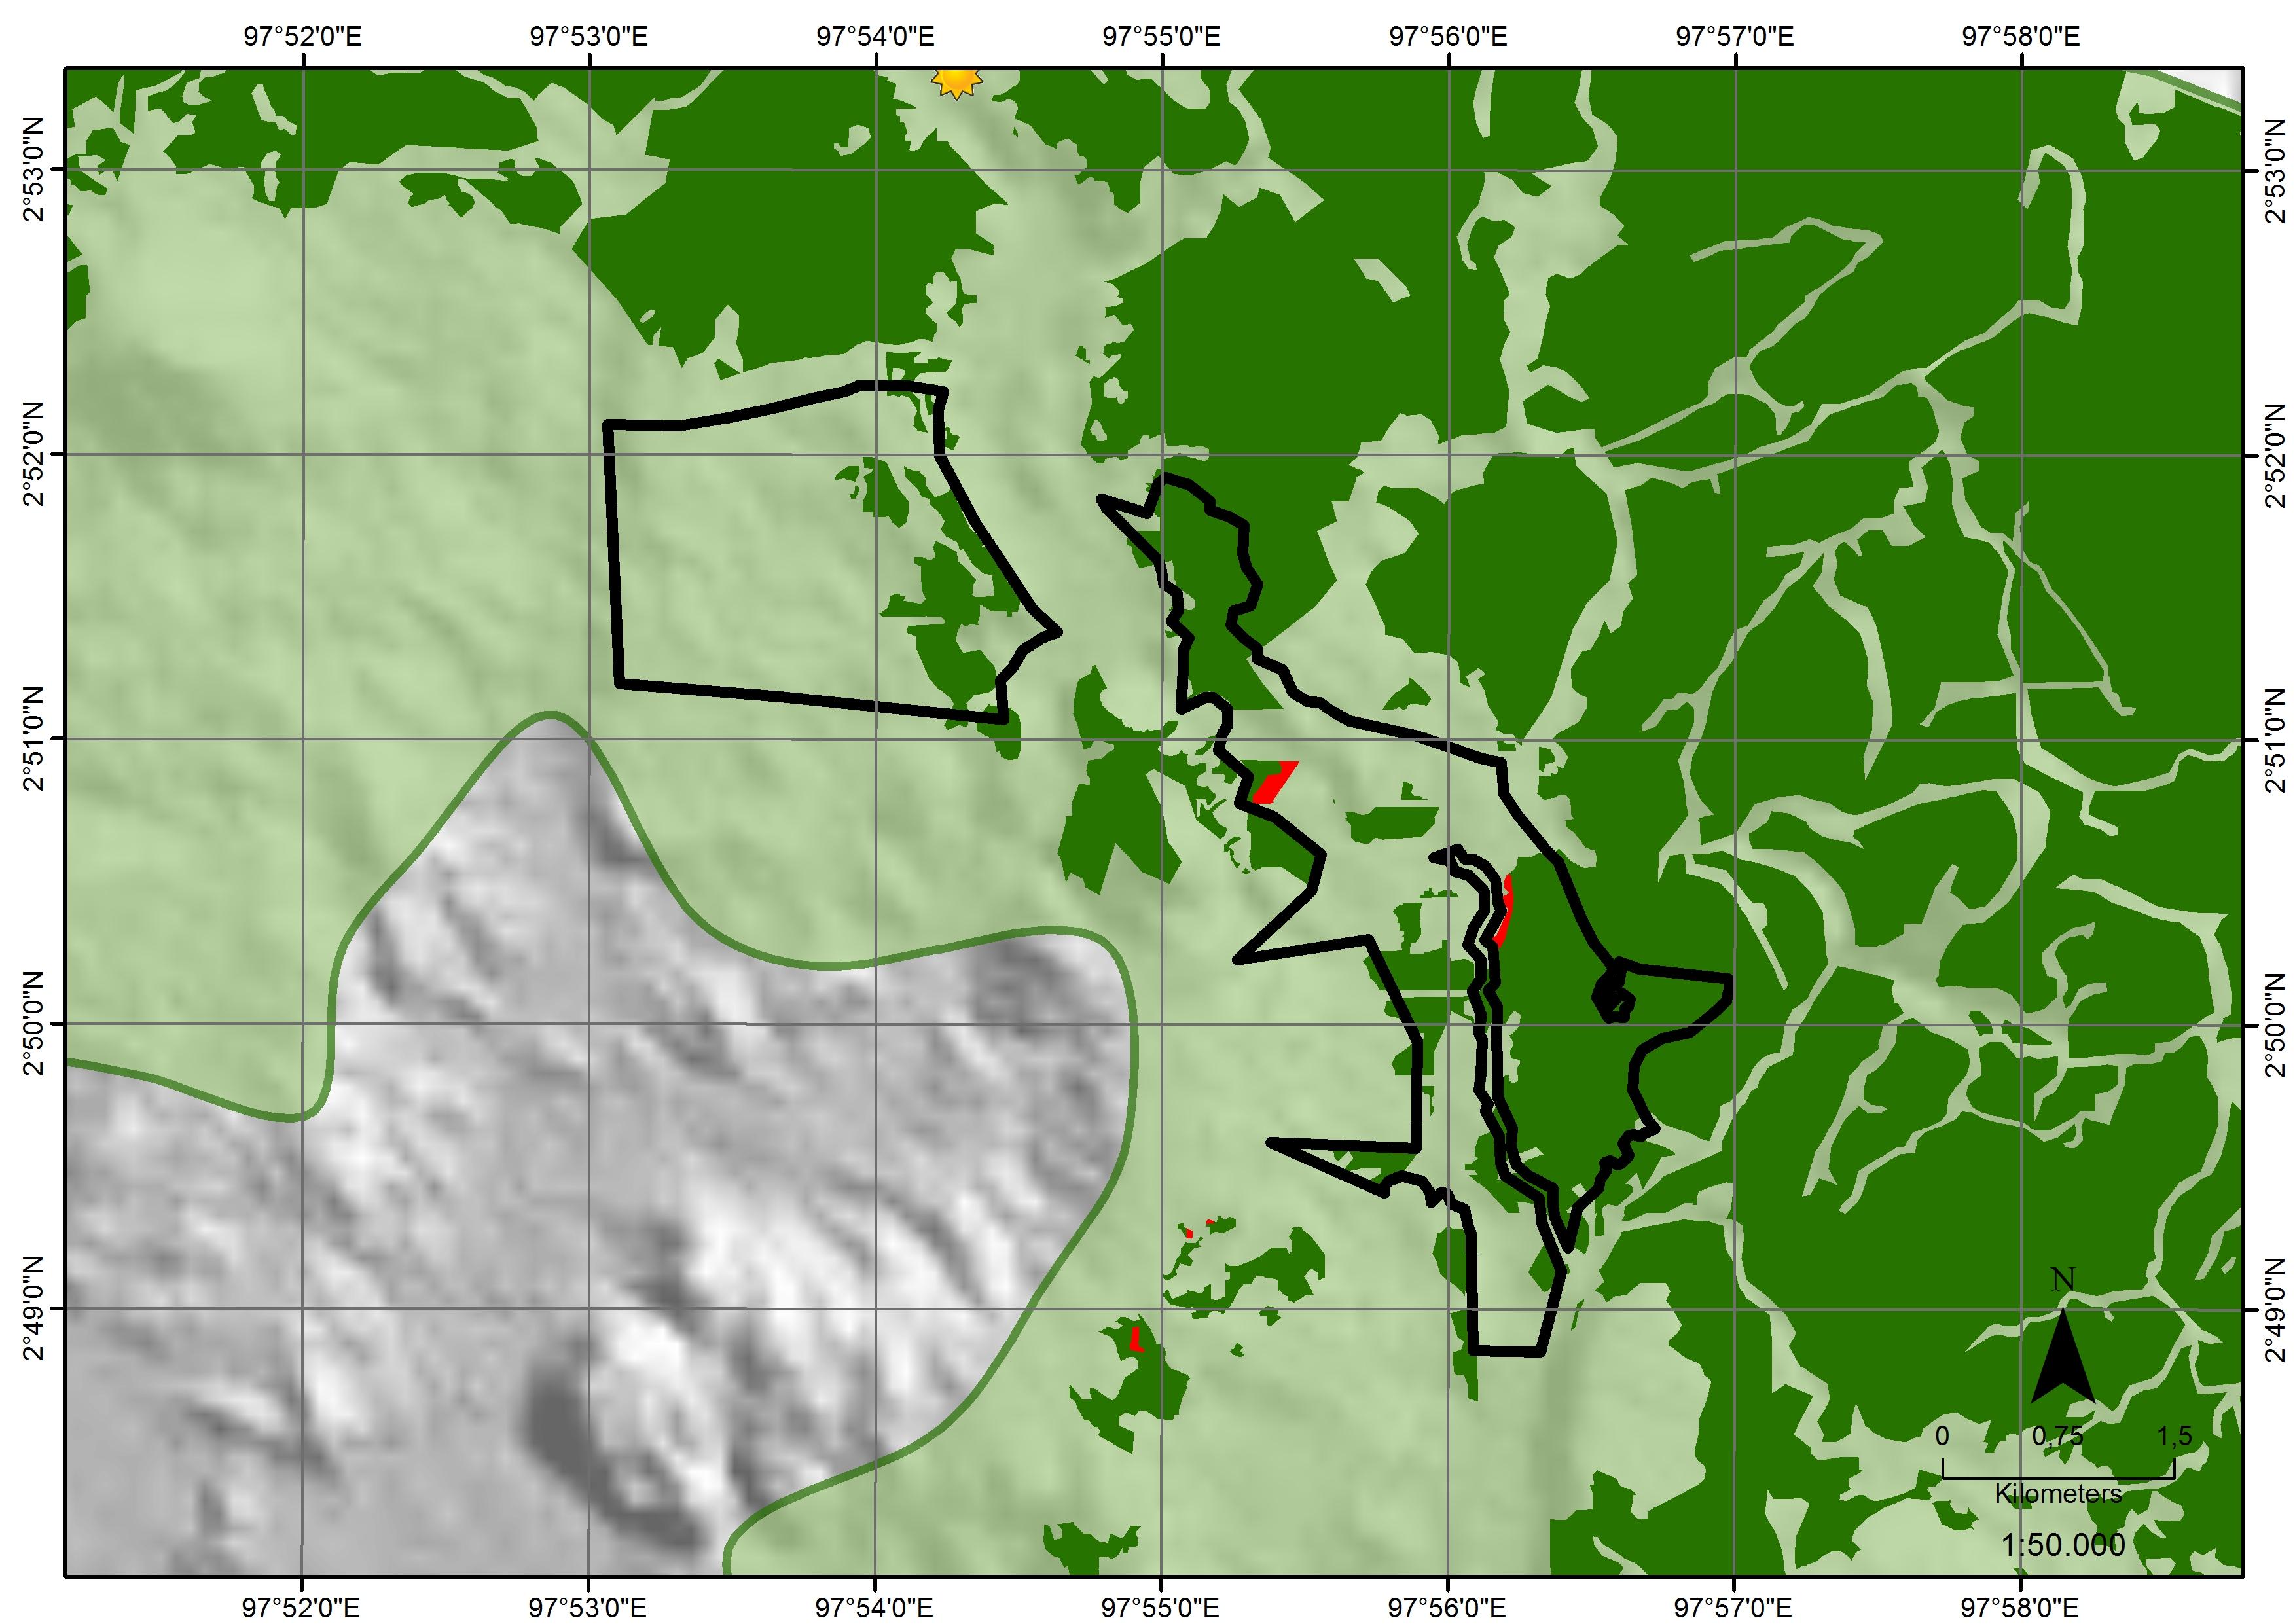 Indo Sawit satellite analysis image